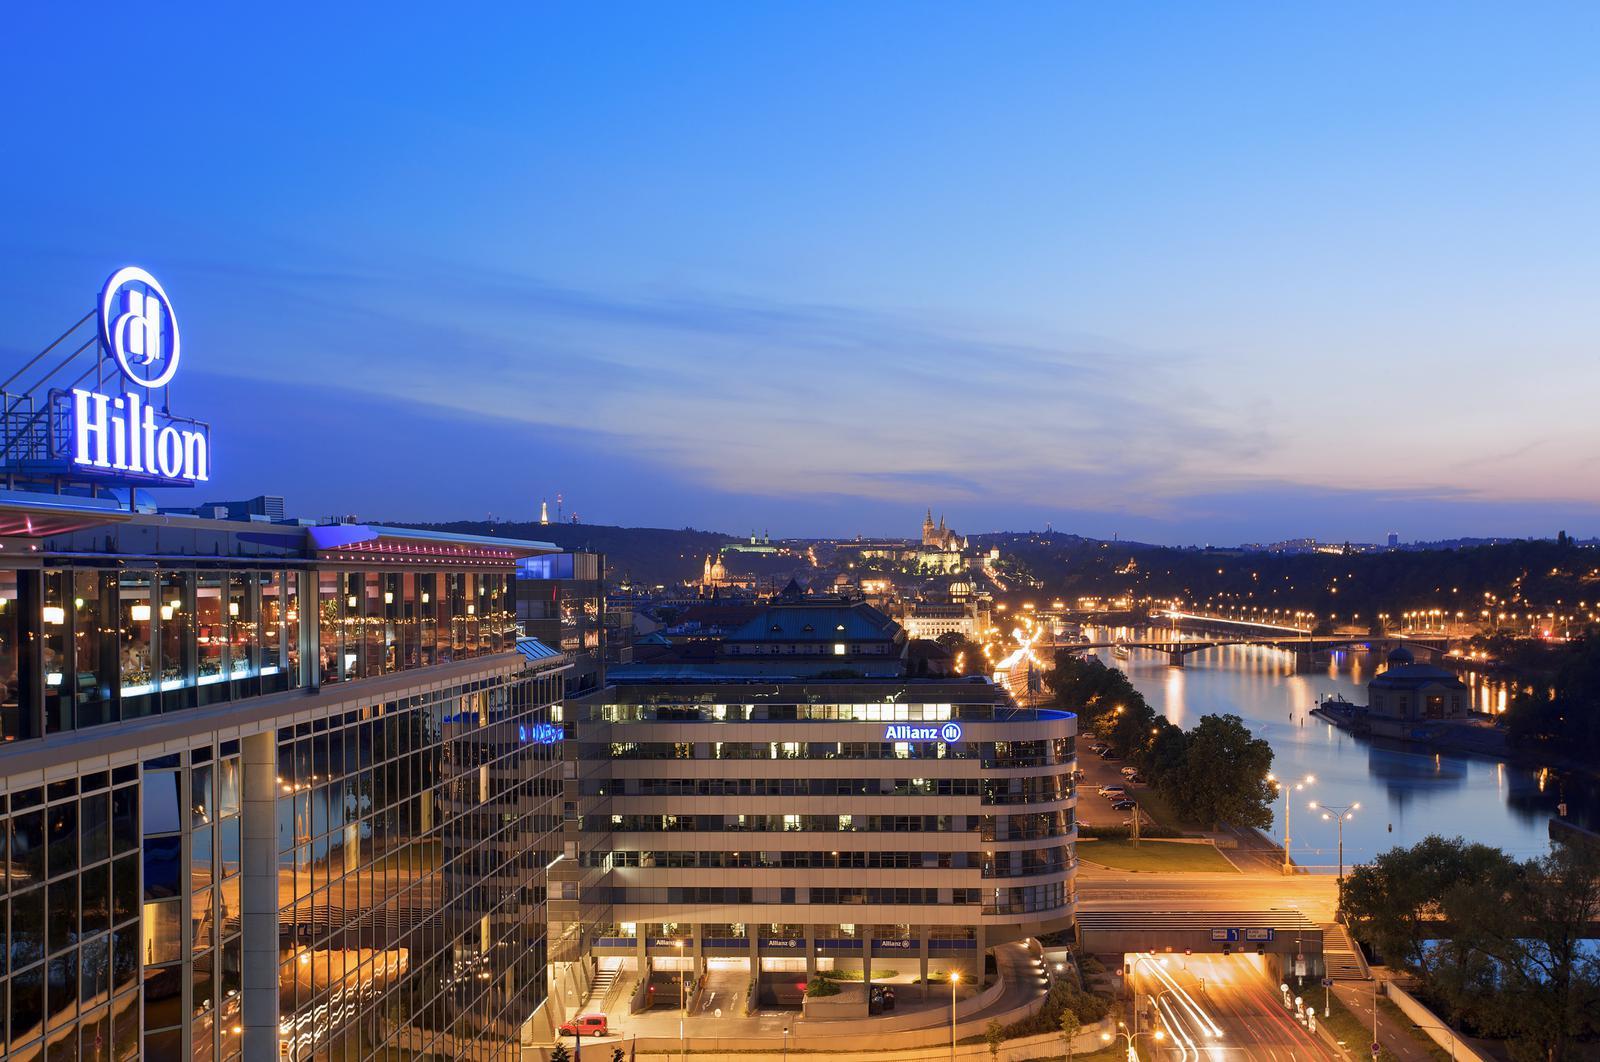 Hilton Prague, em Praga hotéis para jogar poker